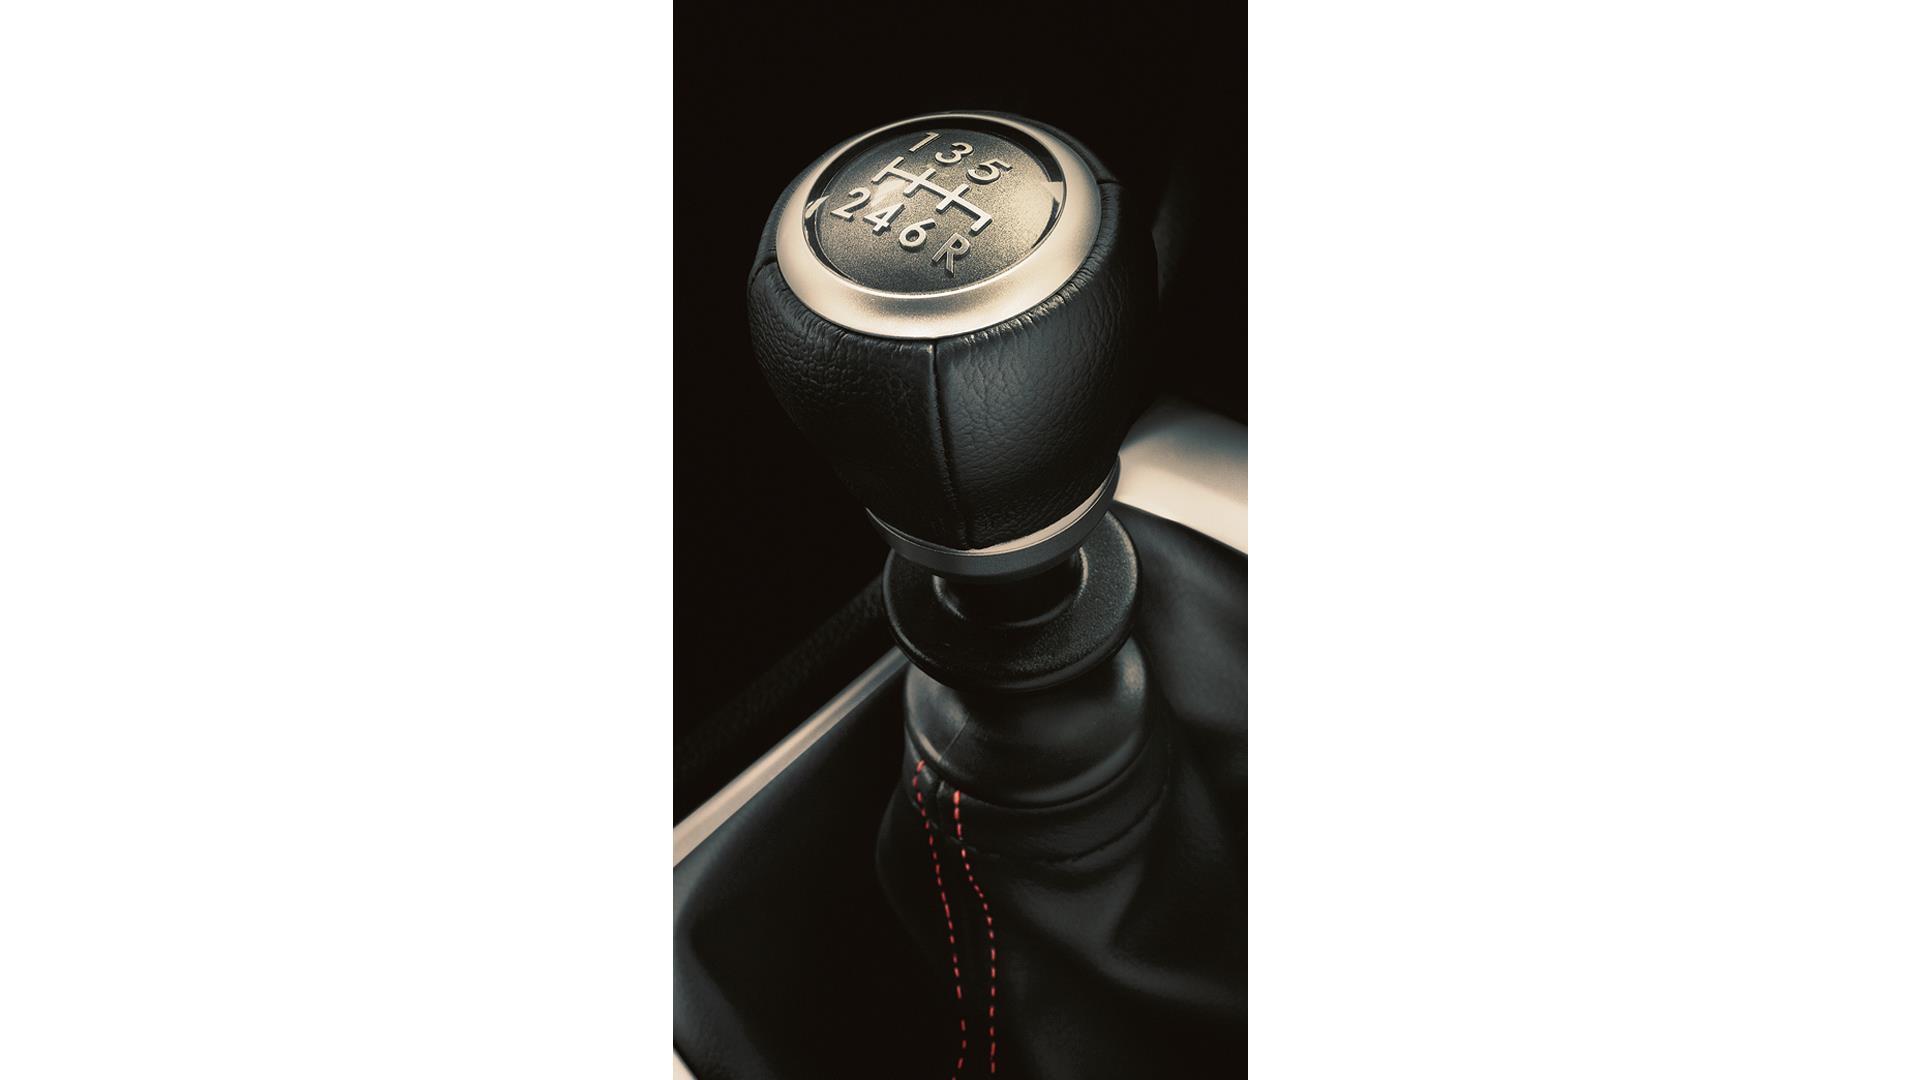 Shop Genuine Subaru Crosstrek Accessories From Heuberger